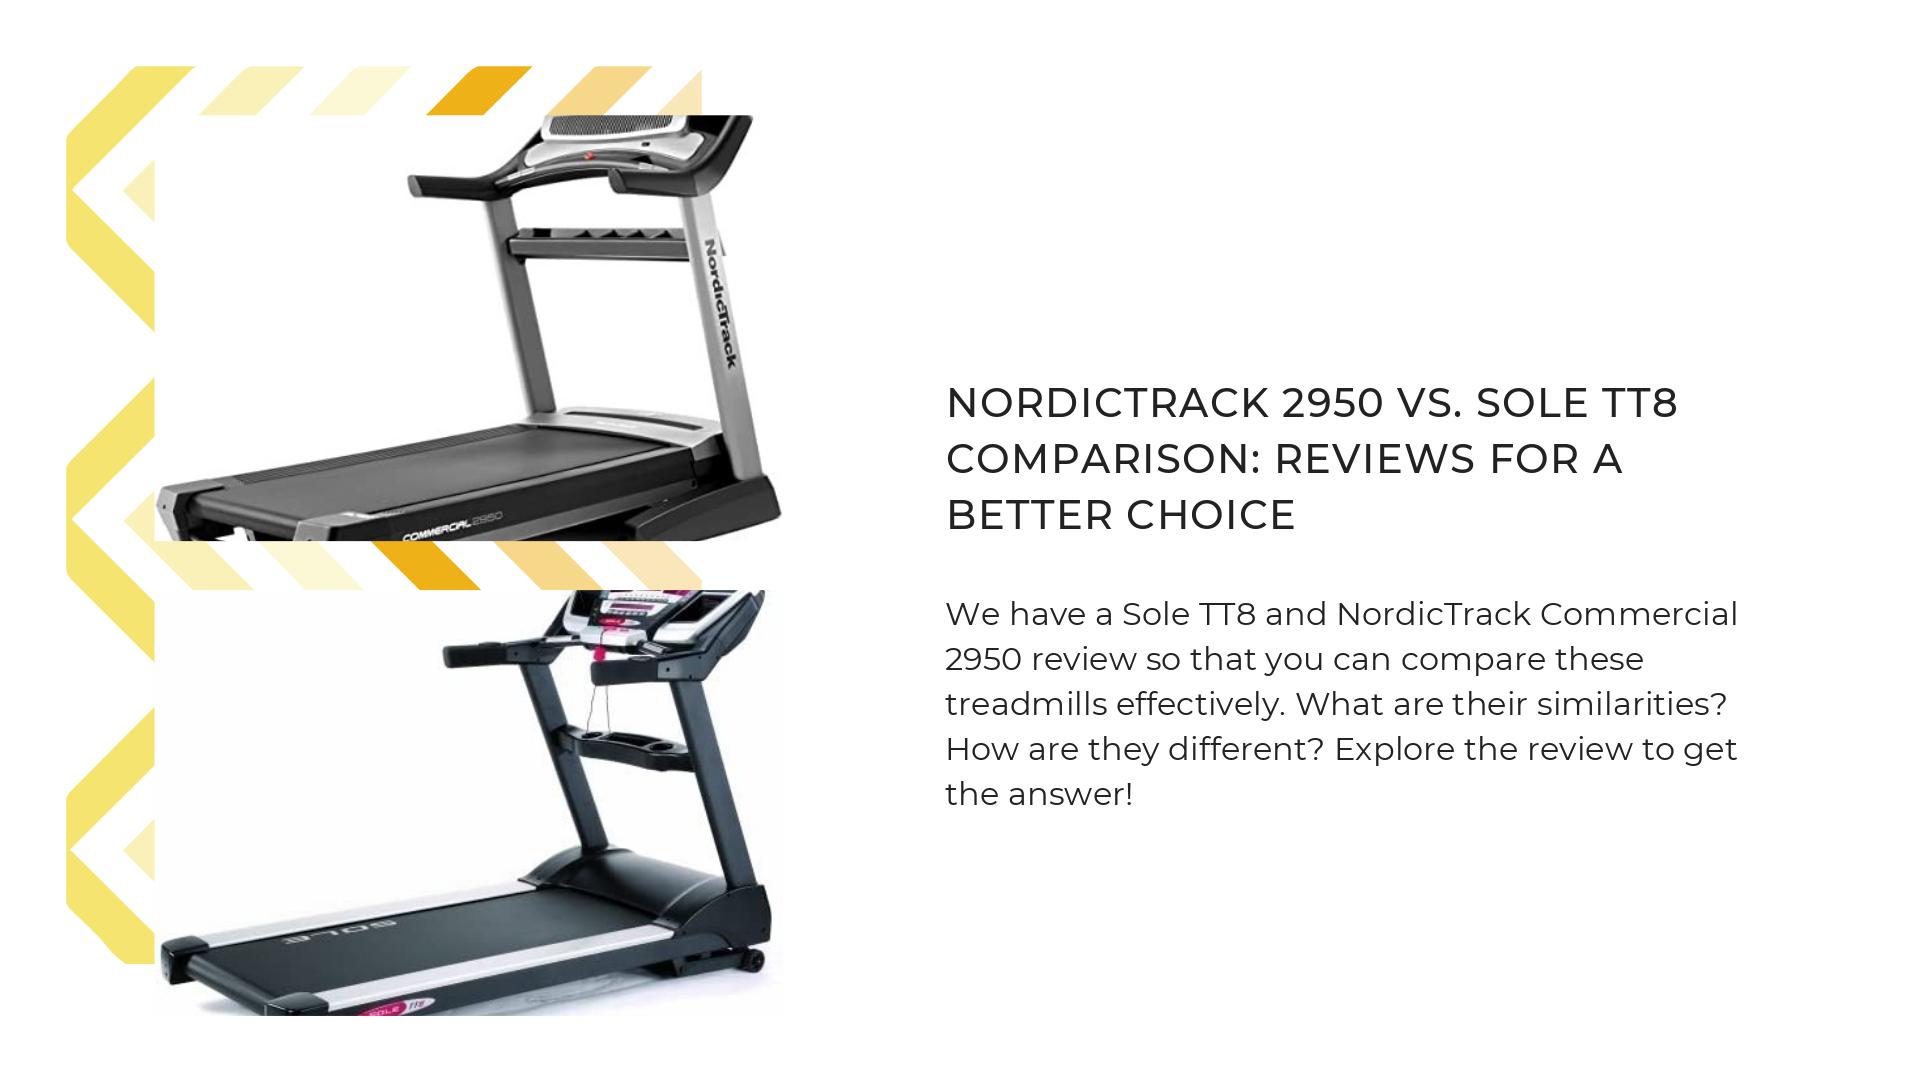 NordicTrack 2950 vs. Sole TT8 comparison: Reviews for a better choice